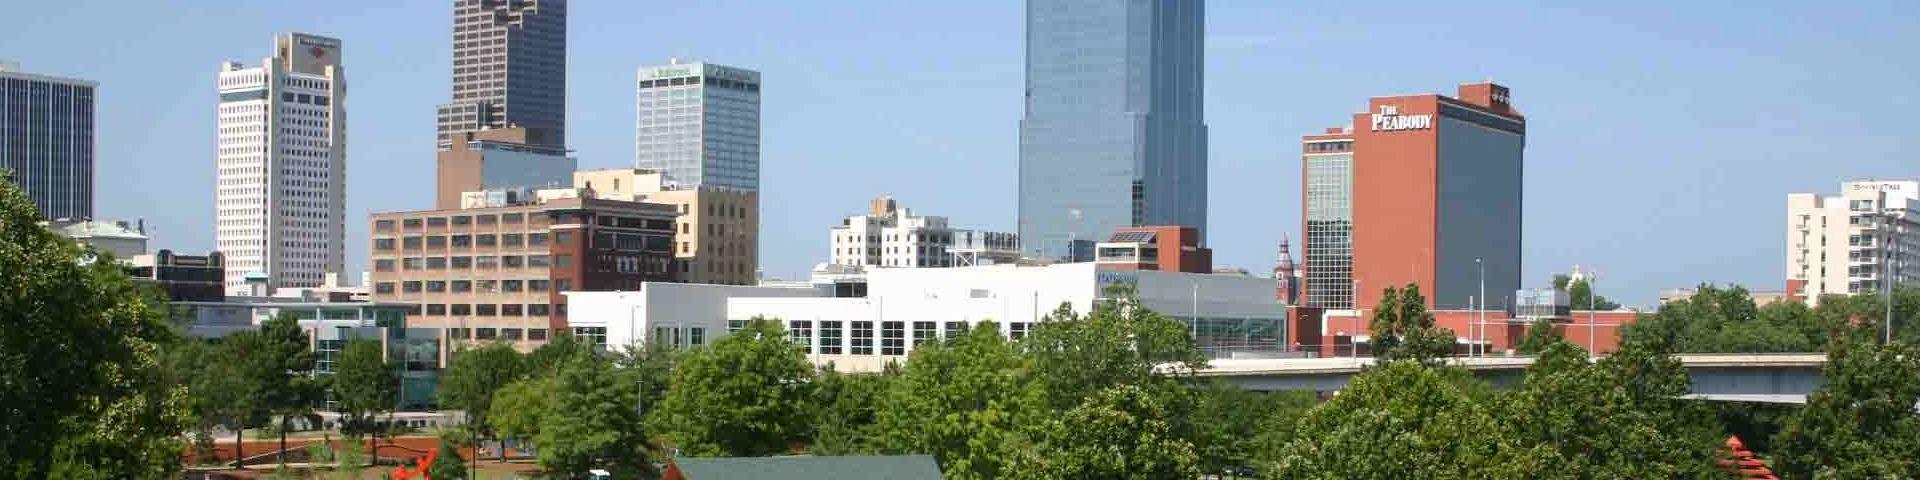 Компания IGT начала принимать ставки на спорт в Арканзасе